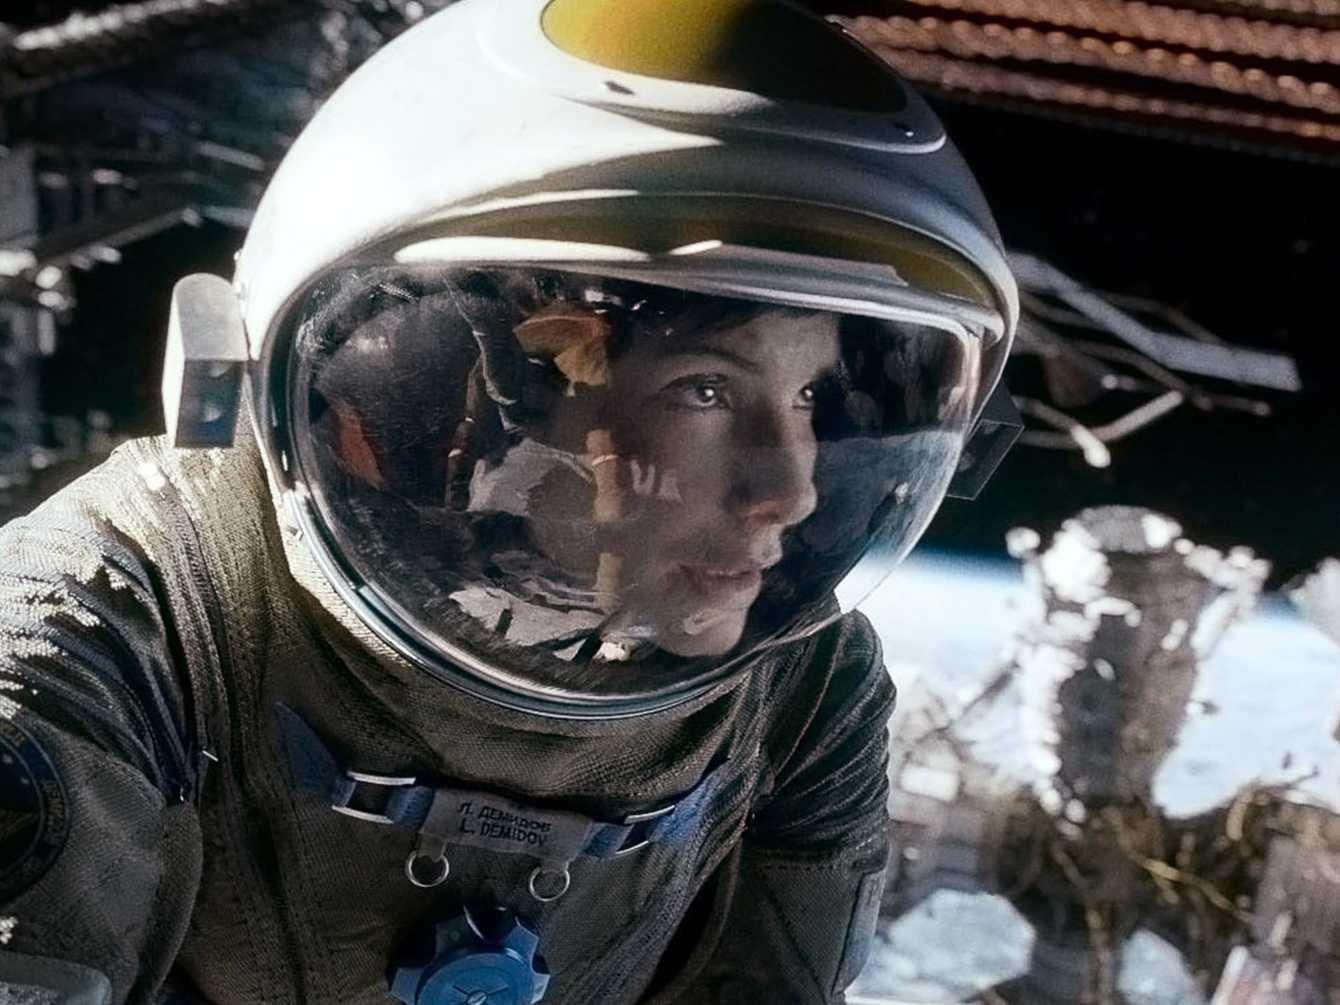 sandra-bullocks-new-movie-gravity-is-an-extreme-4-d-thrill-ride.jpg